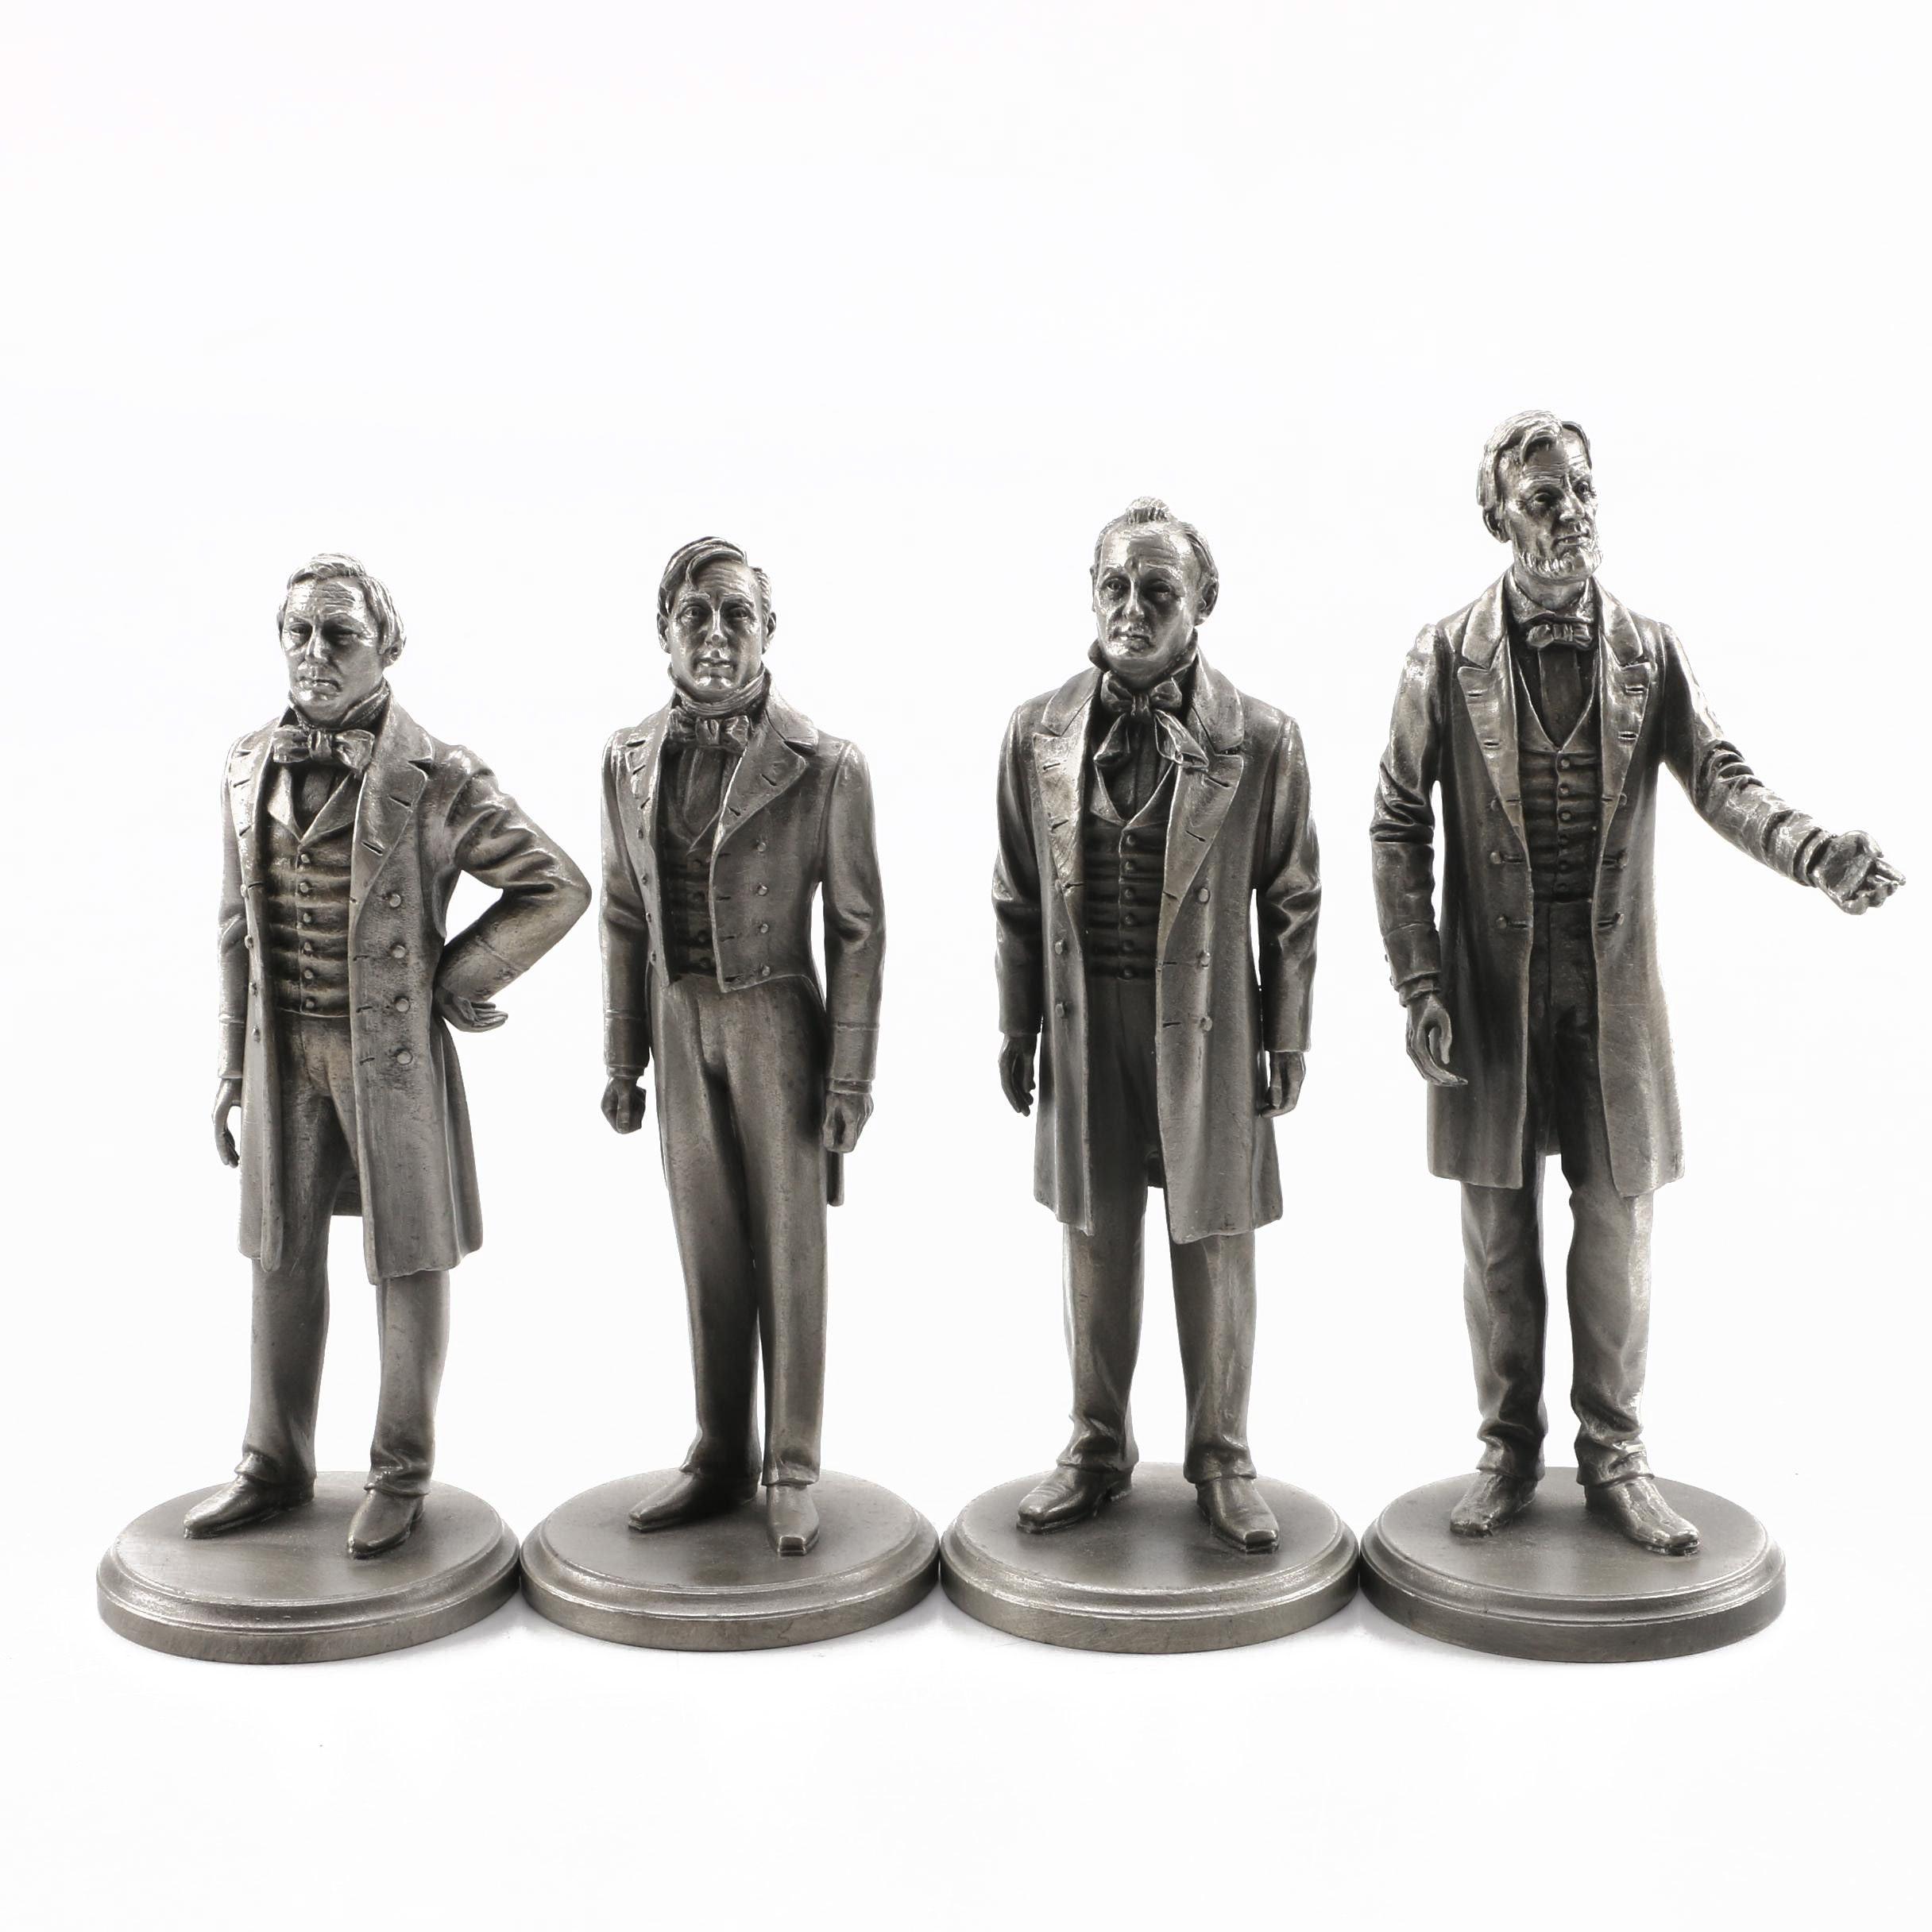 Lance Pewter President Figures Fillmore, Pierce, Buchanan, Lincoln